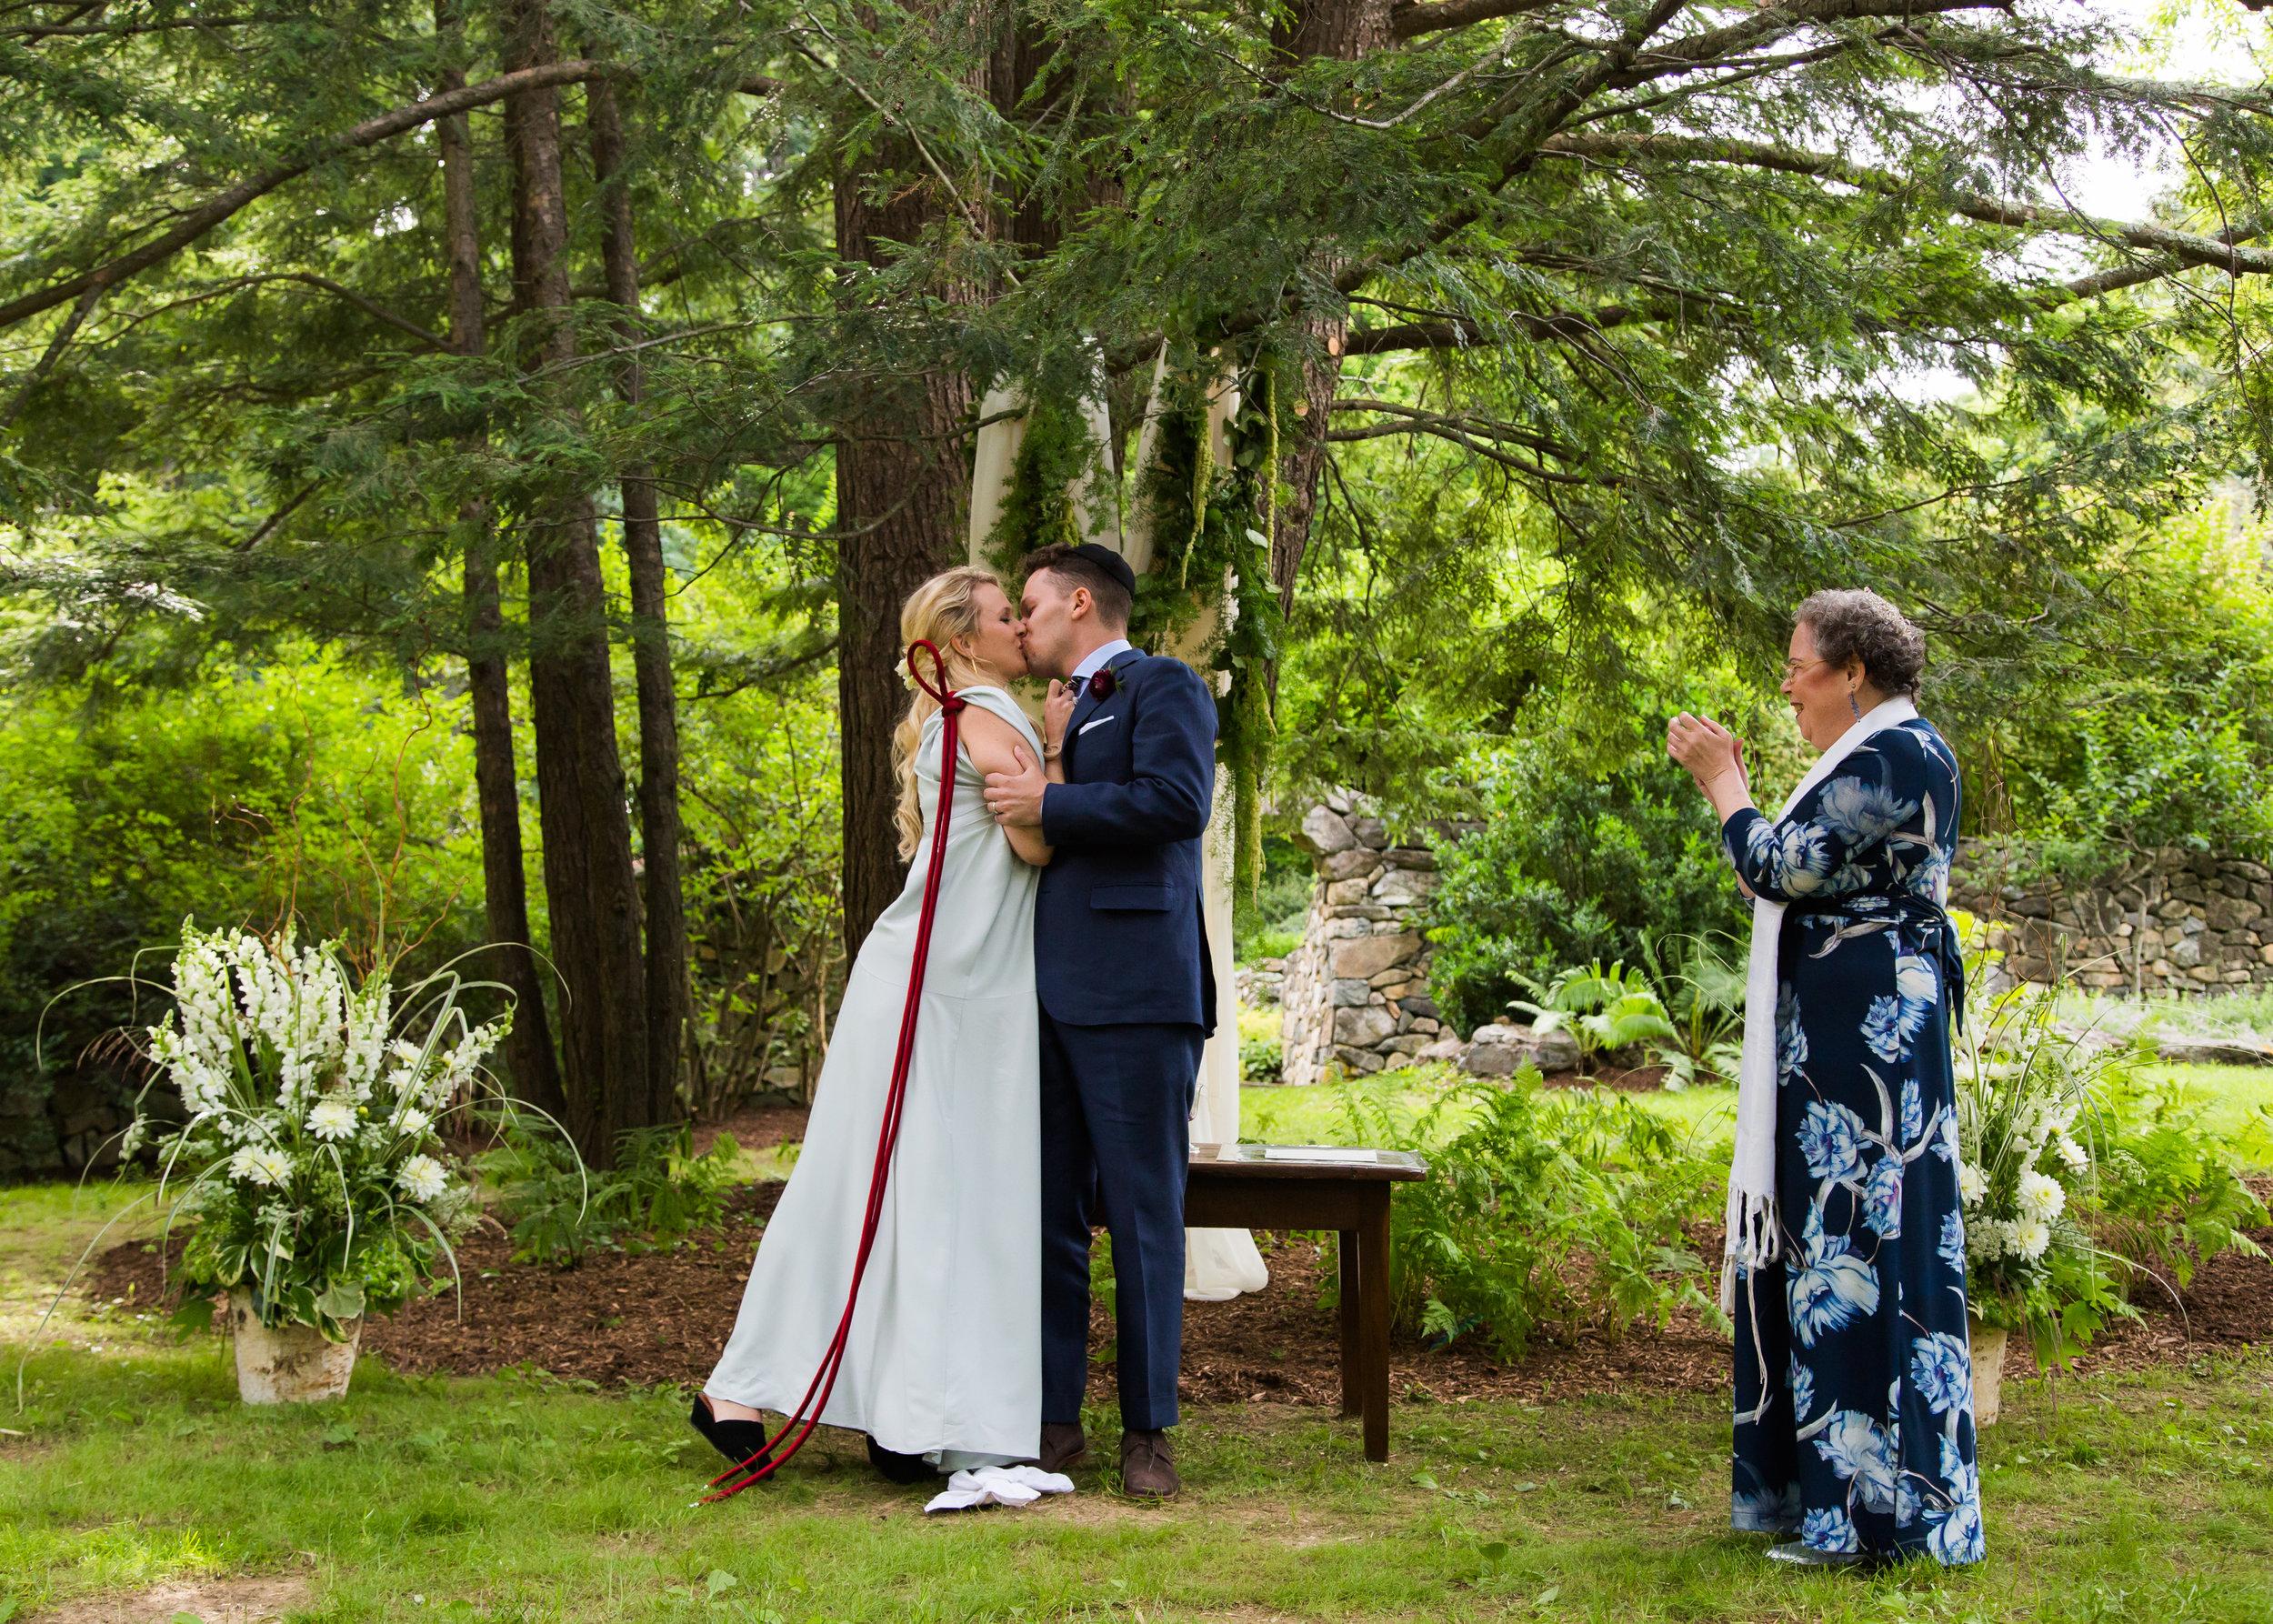 Julie-and-Peter-Wedding07212018-590.jpg